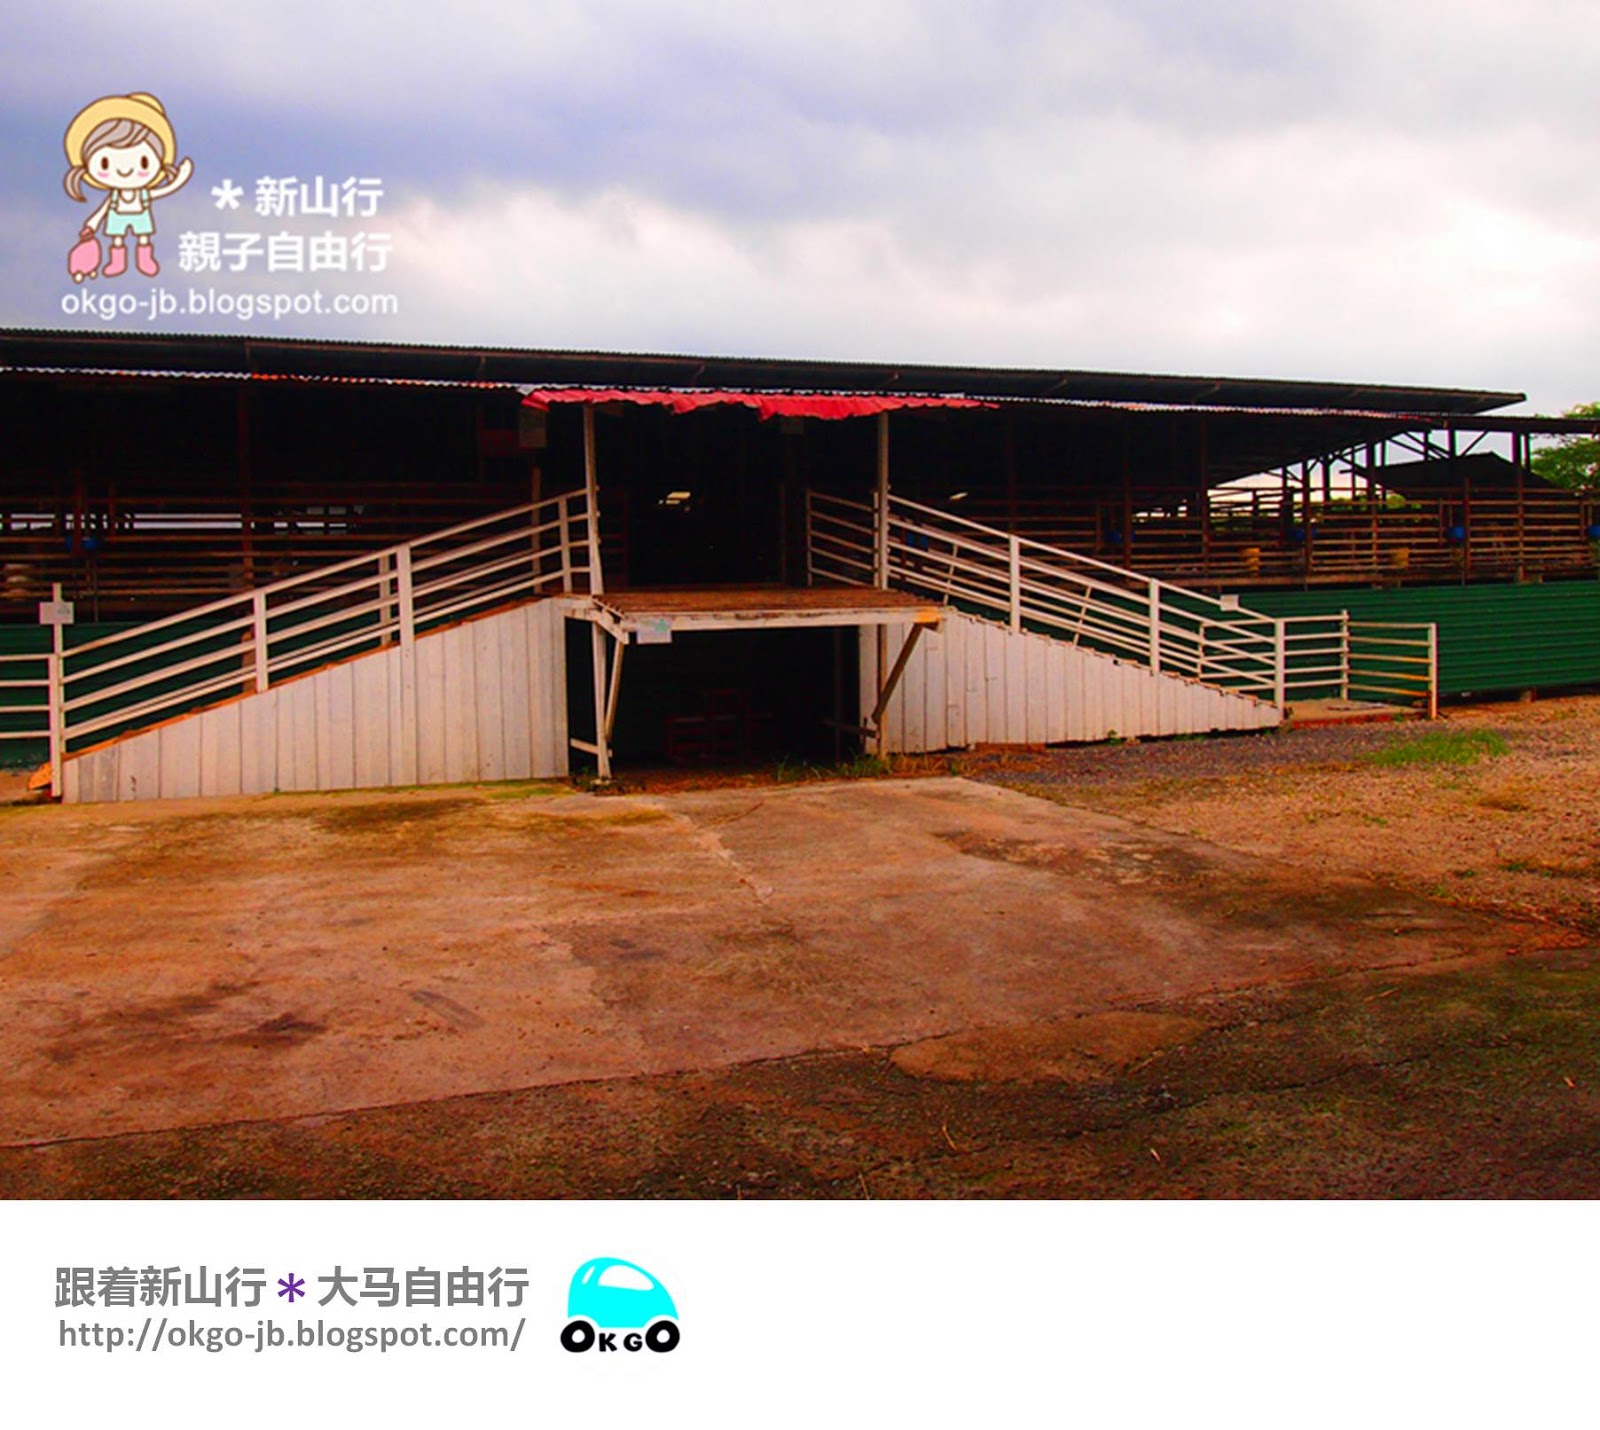 Kluang UK Goat Farm